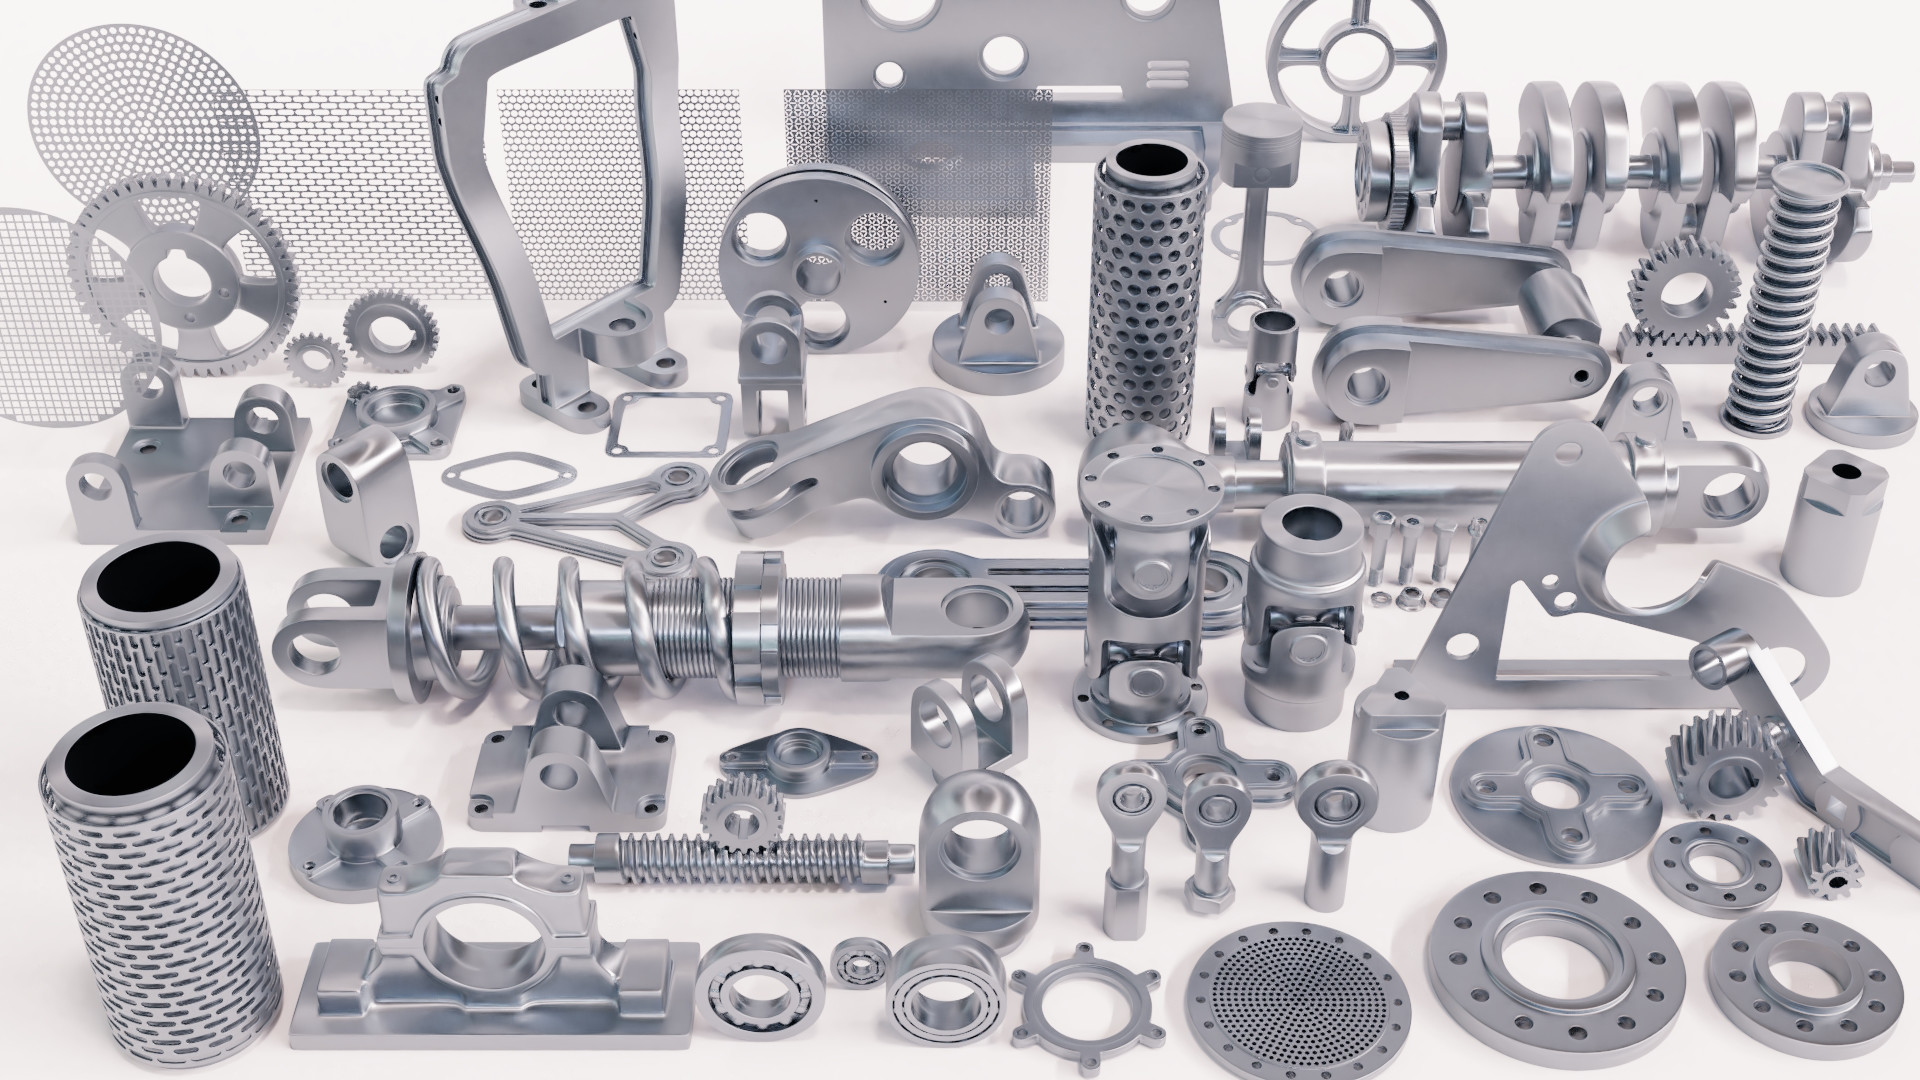 Karl andreas gross mechanical kitbash vol 1 img000